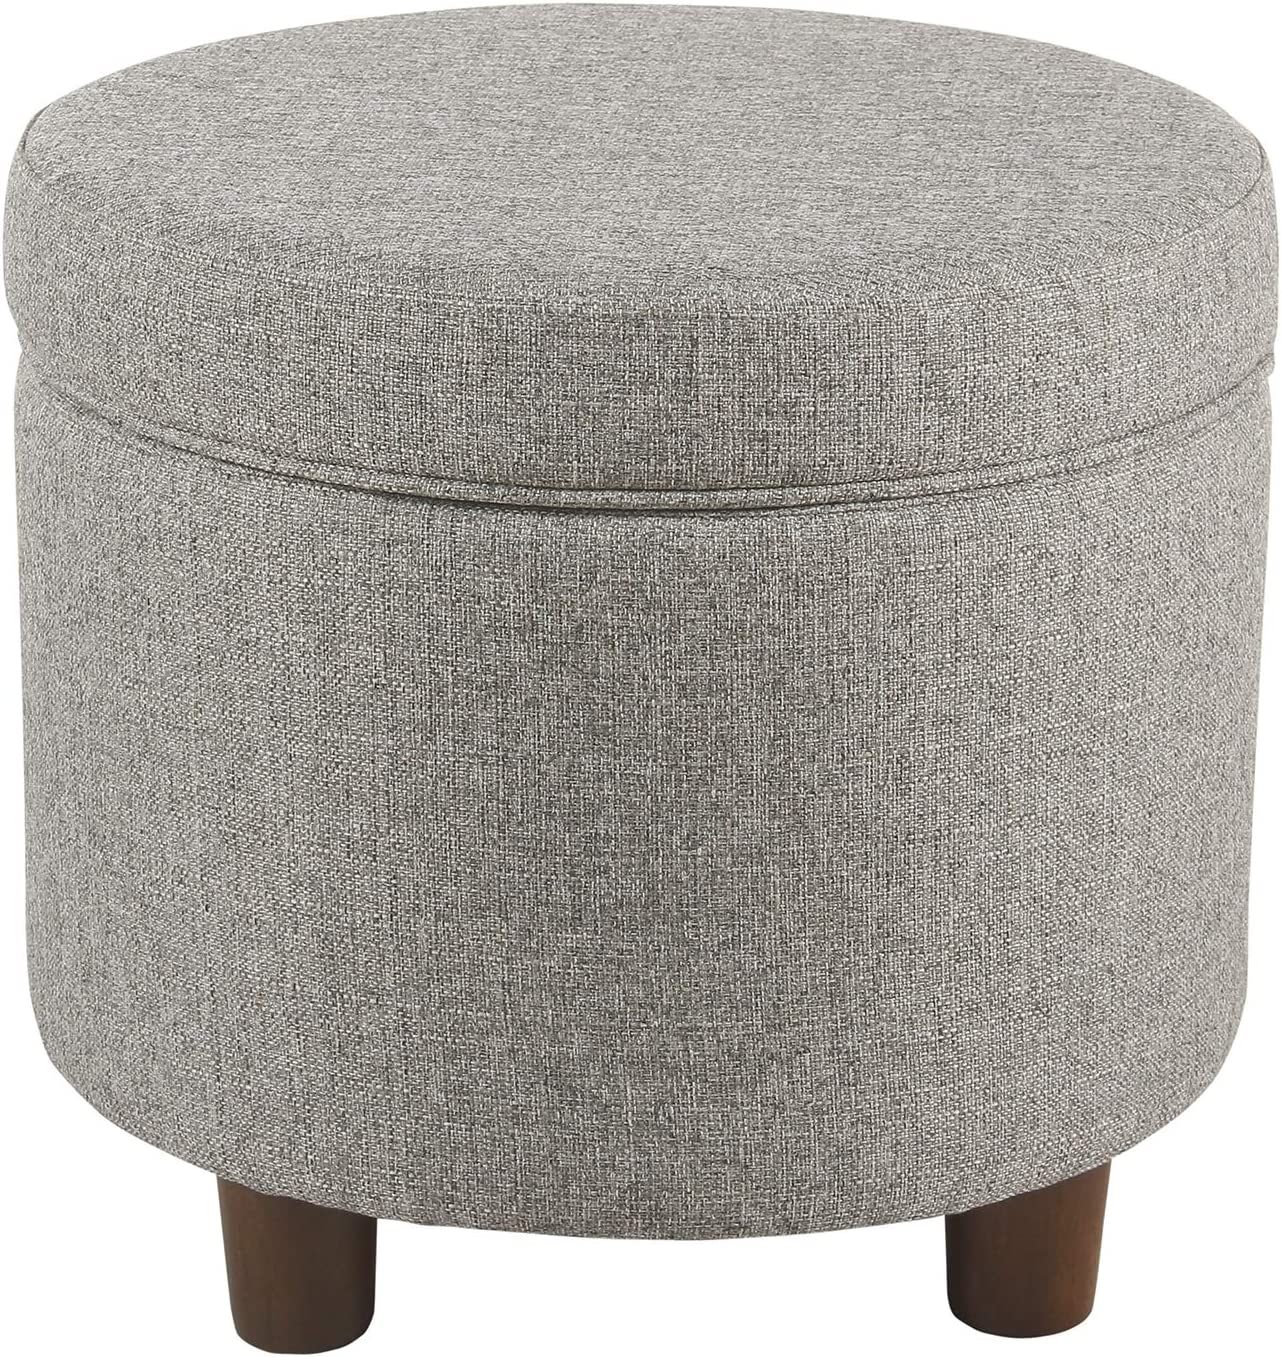 HomePop Round Tweed Storage Ottoman, Light Gray Tweed